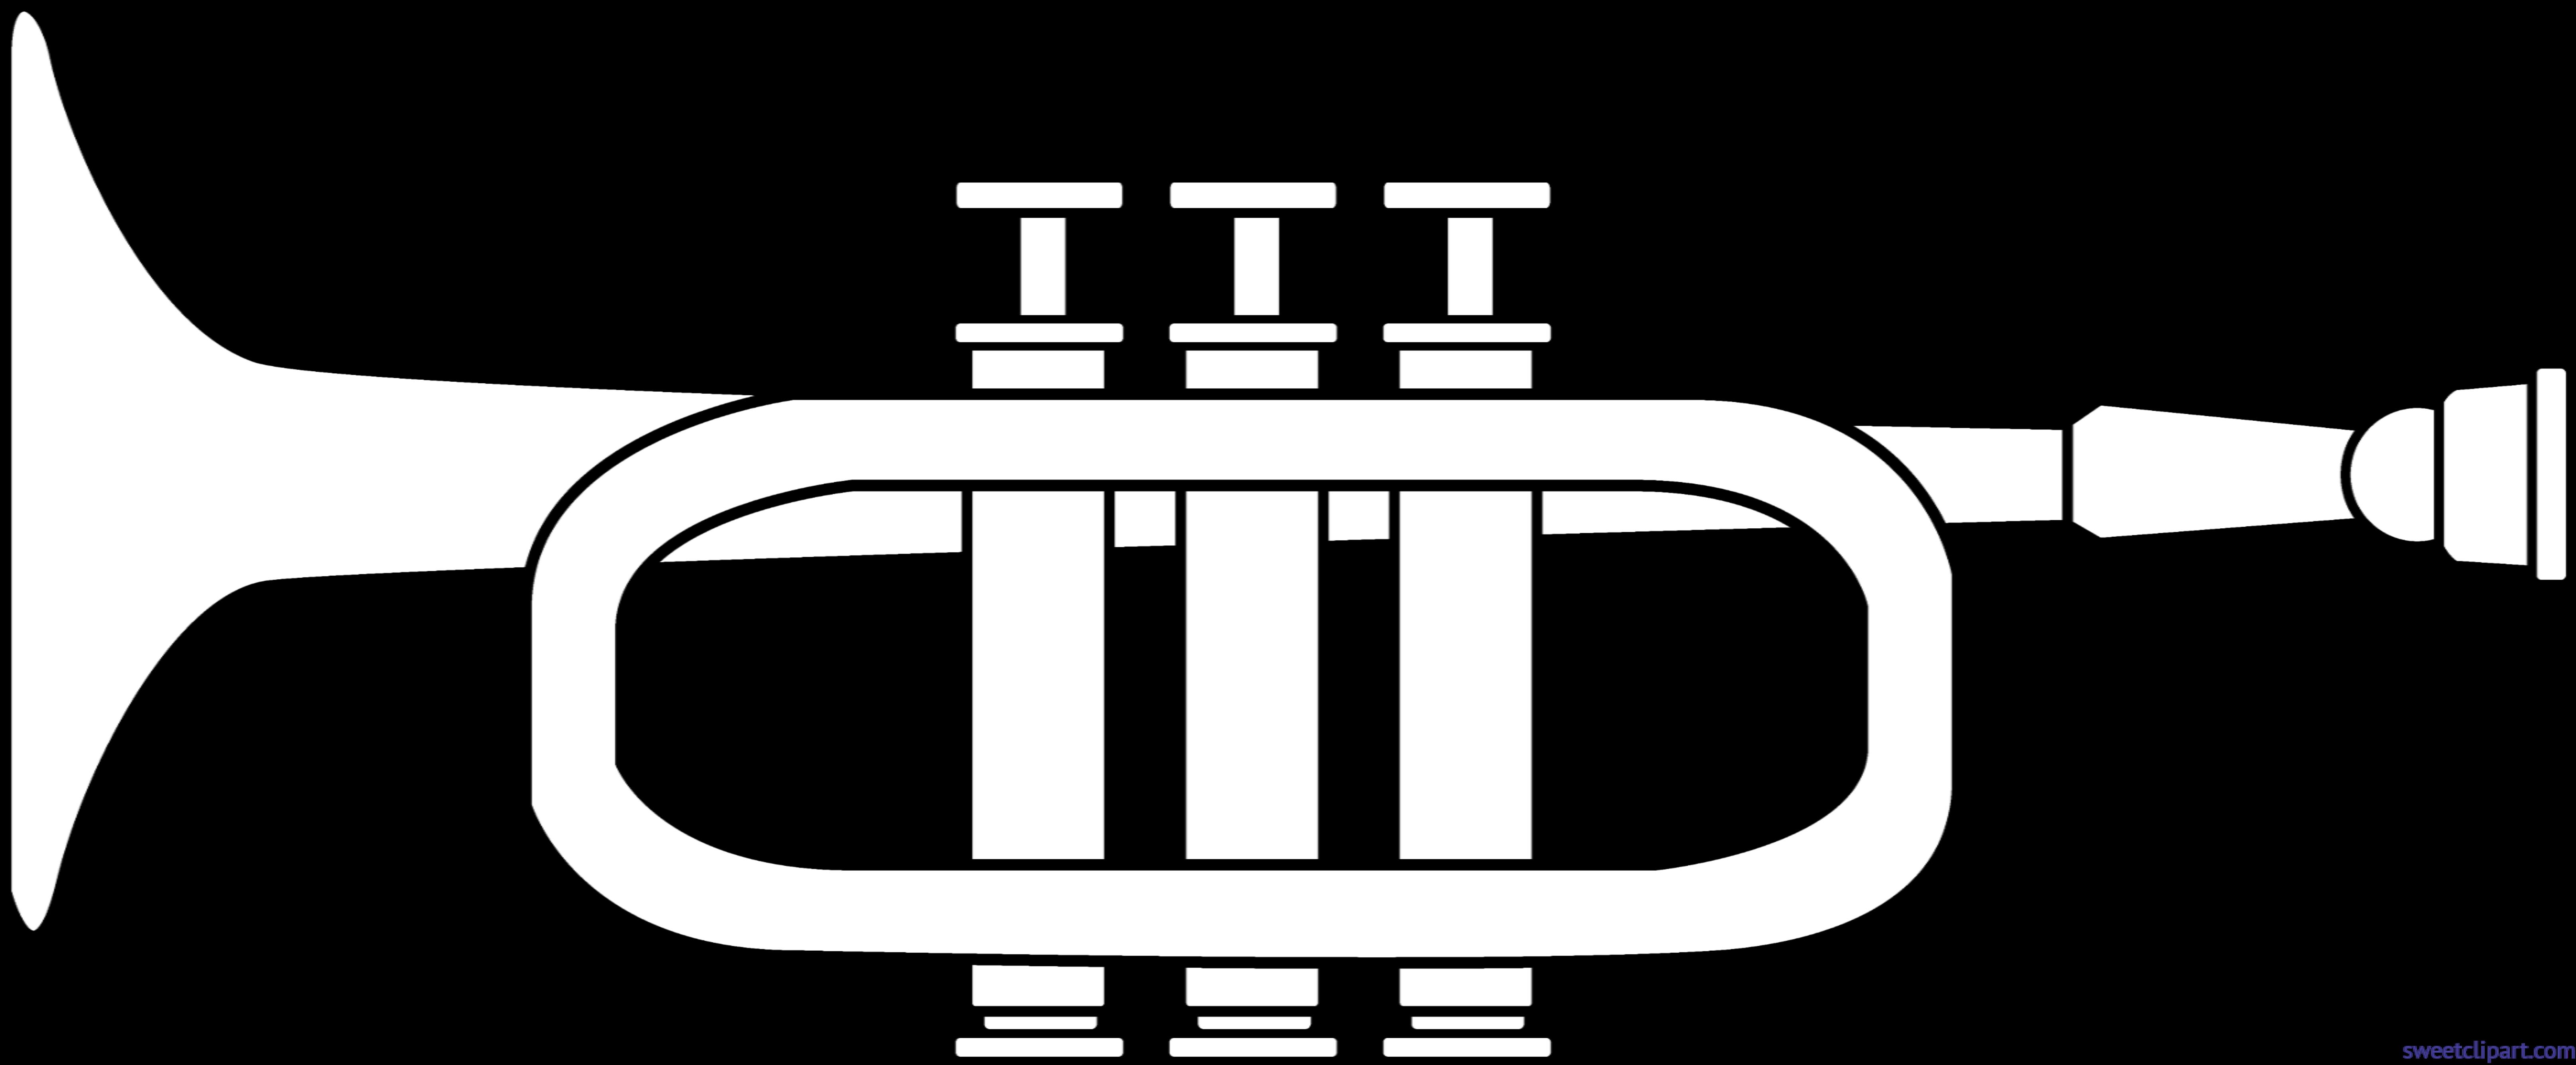 Trumpet lineart clip art. Trombone clipart black and white